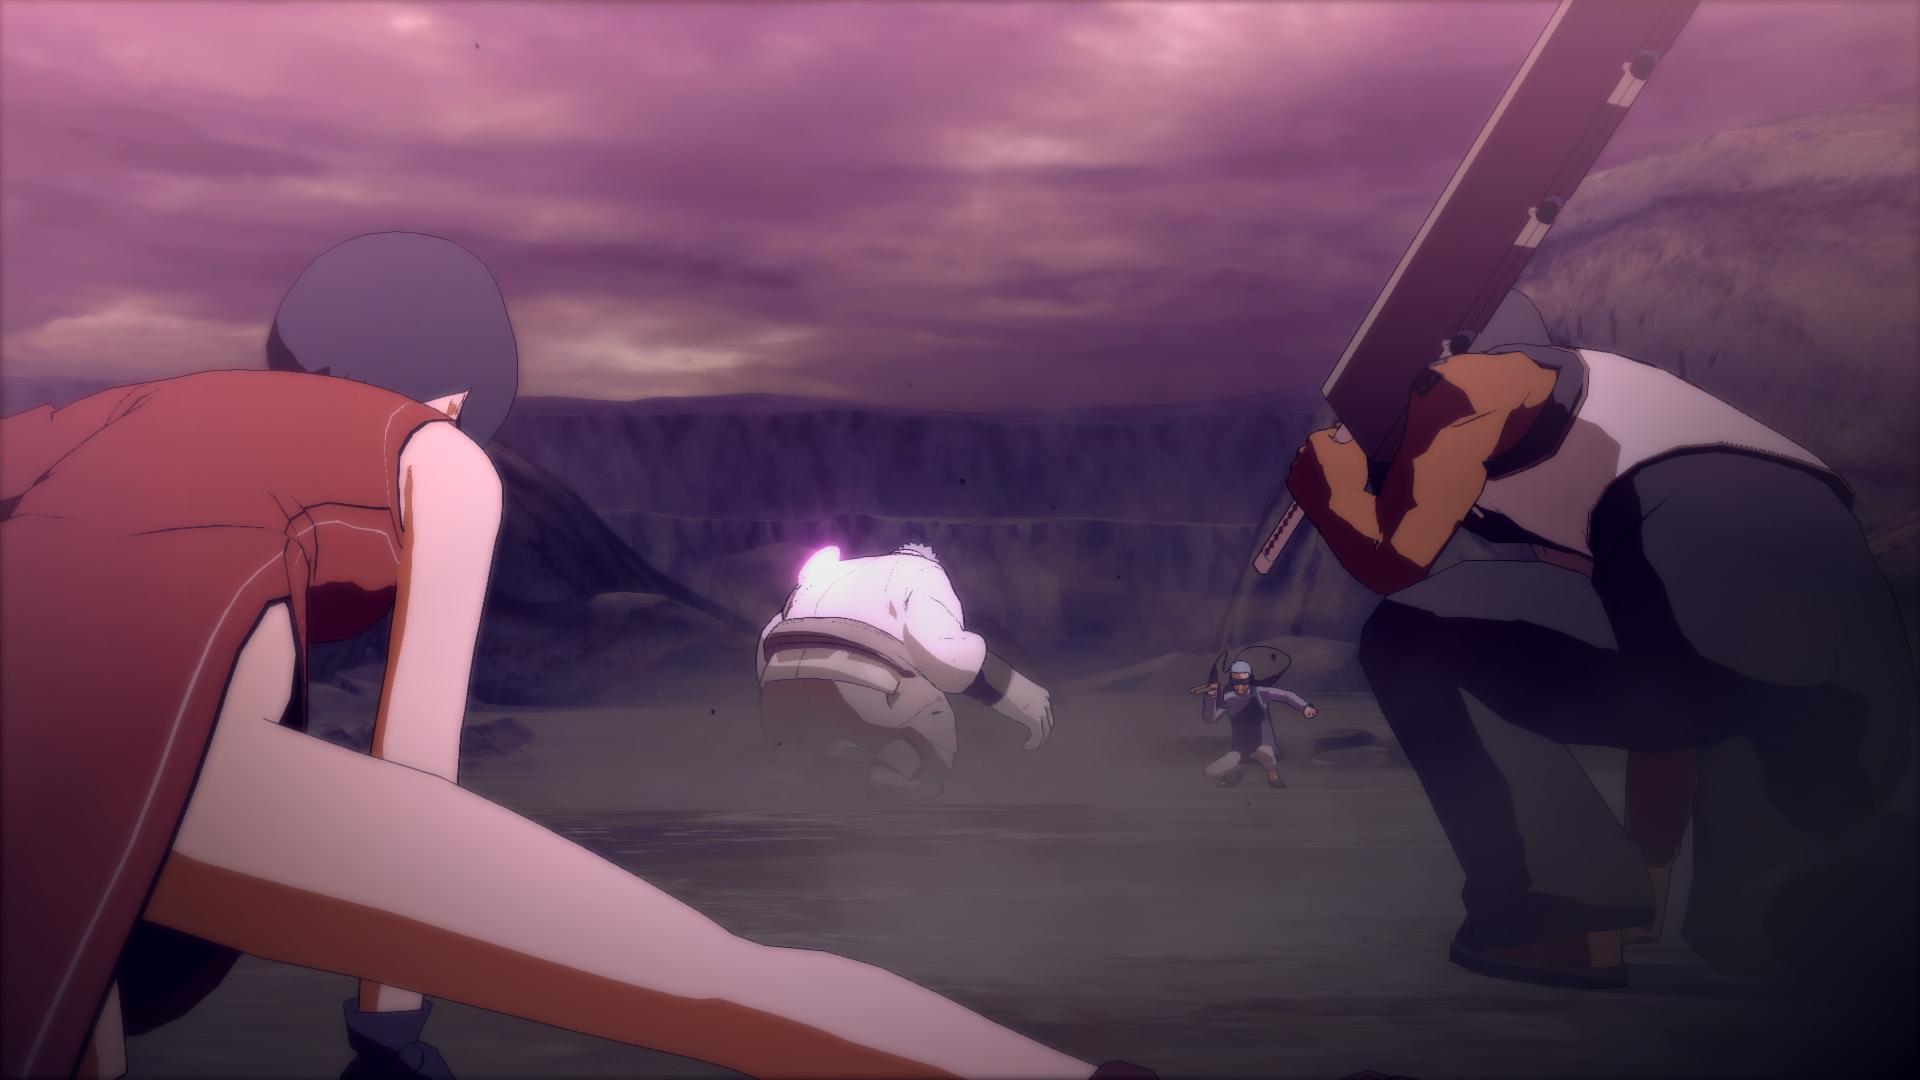 Xbox One Naruto Shippuden Ultimate Ninja Storm 4: Road to Boruto